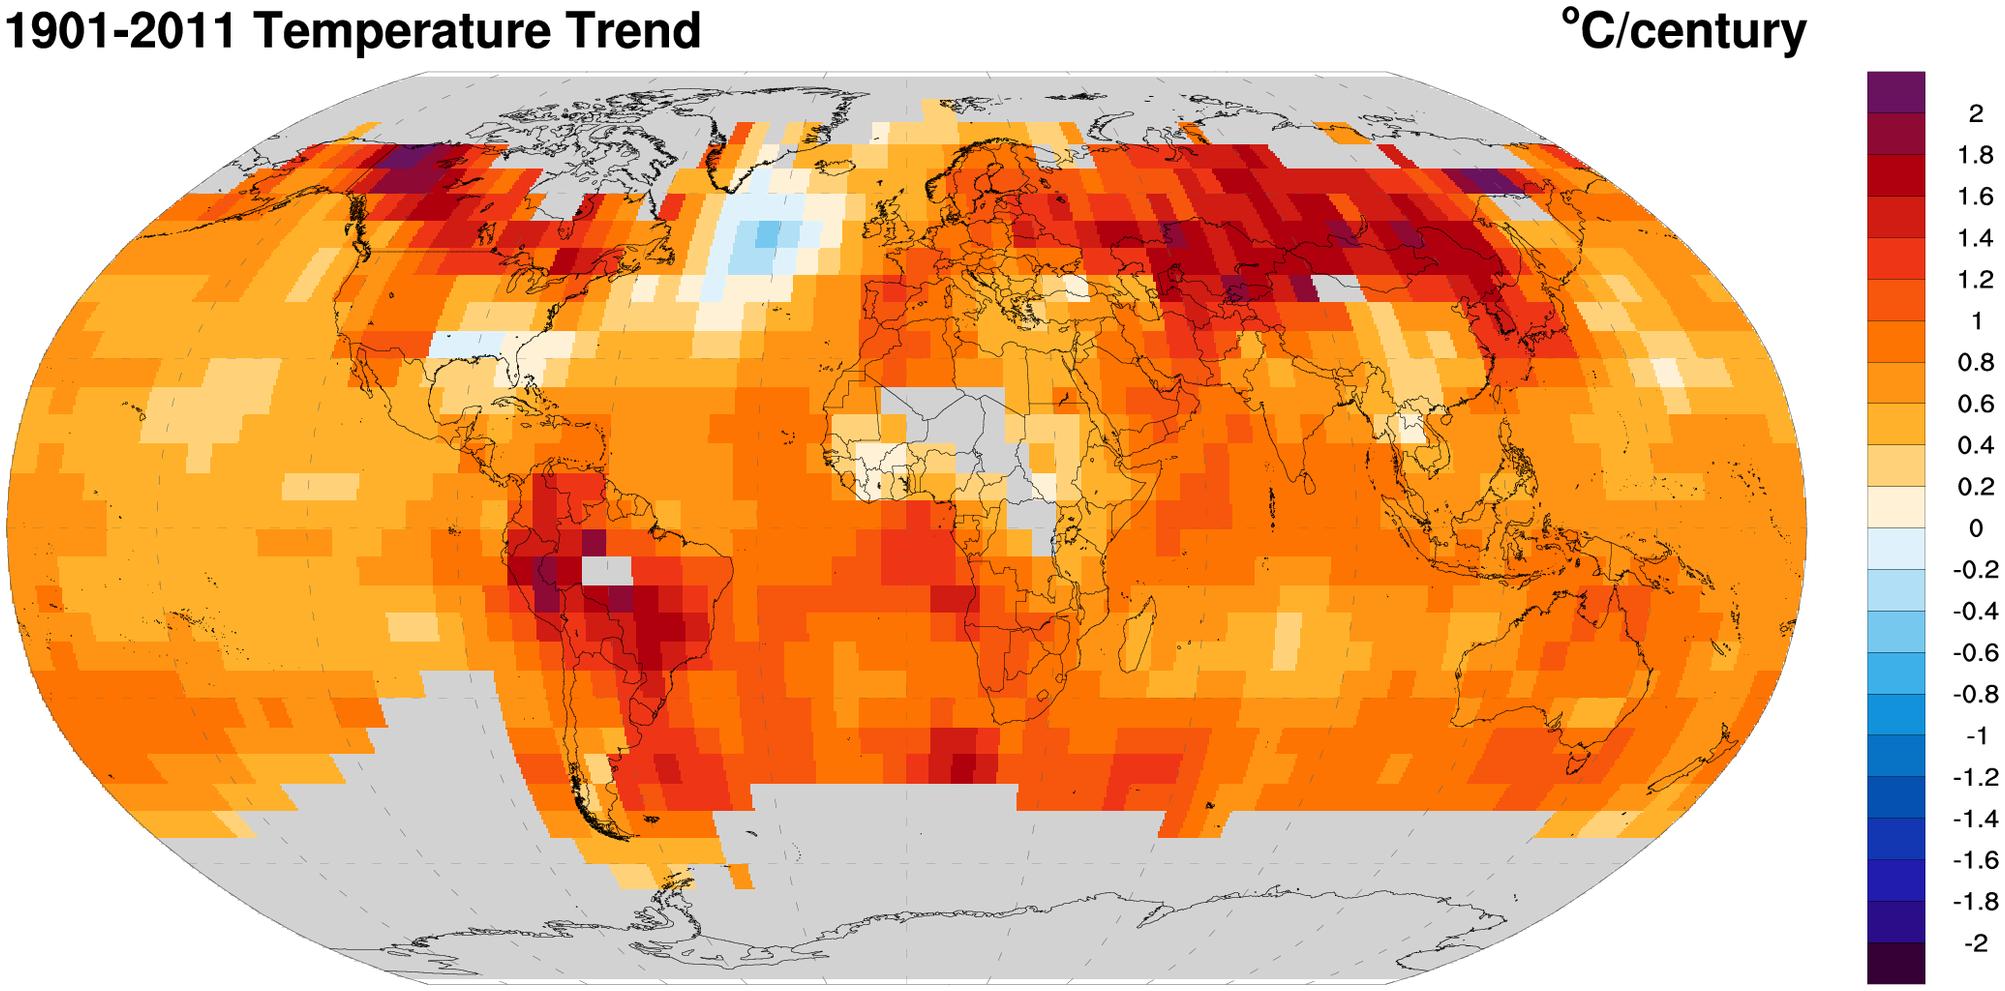 http://upload.wikimedia.org/wikipedia/commons/e/e1/NCDC_temperature_trend.png